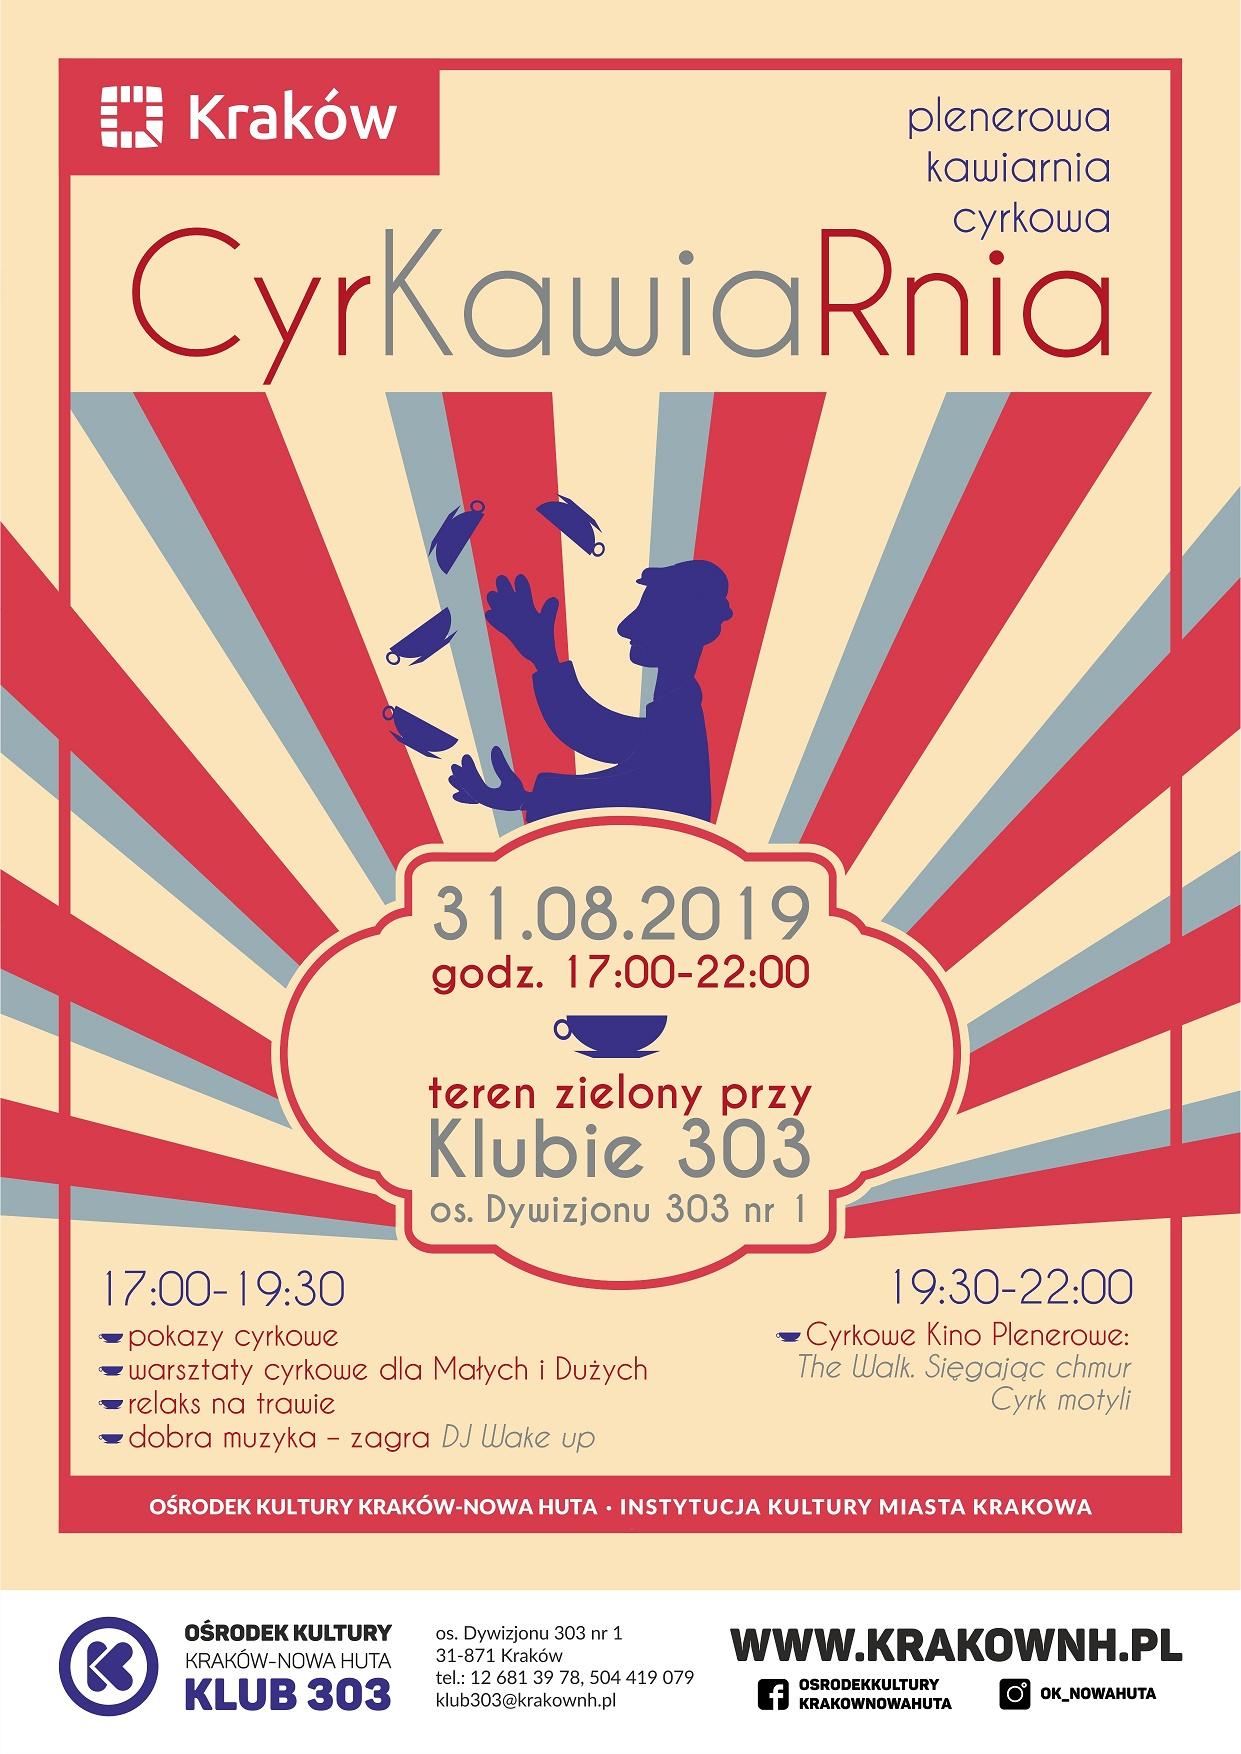 CyrKawiaRnia - plenerowa kawiarnia cyrkowa